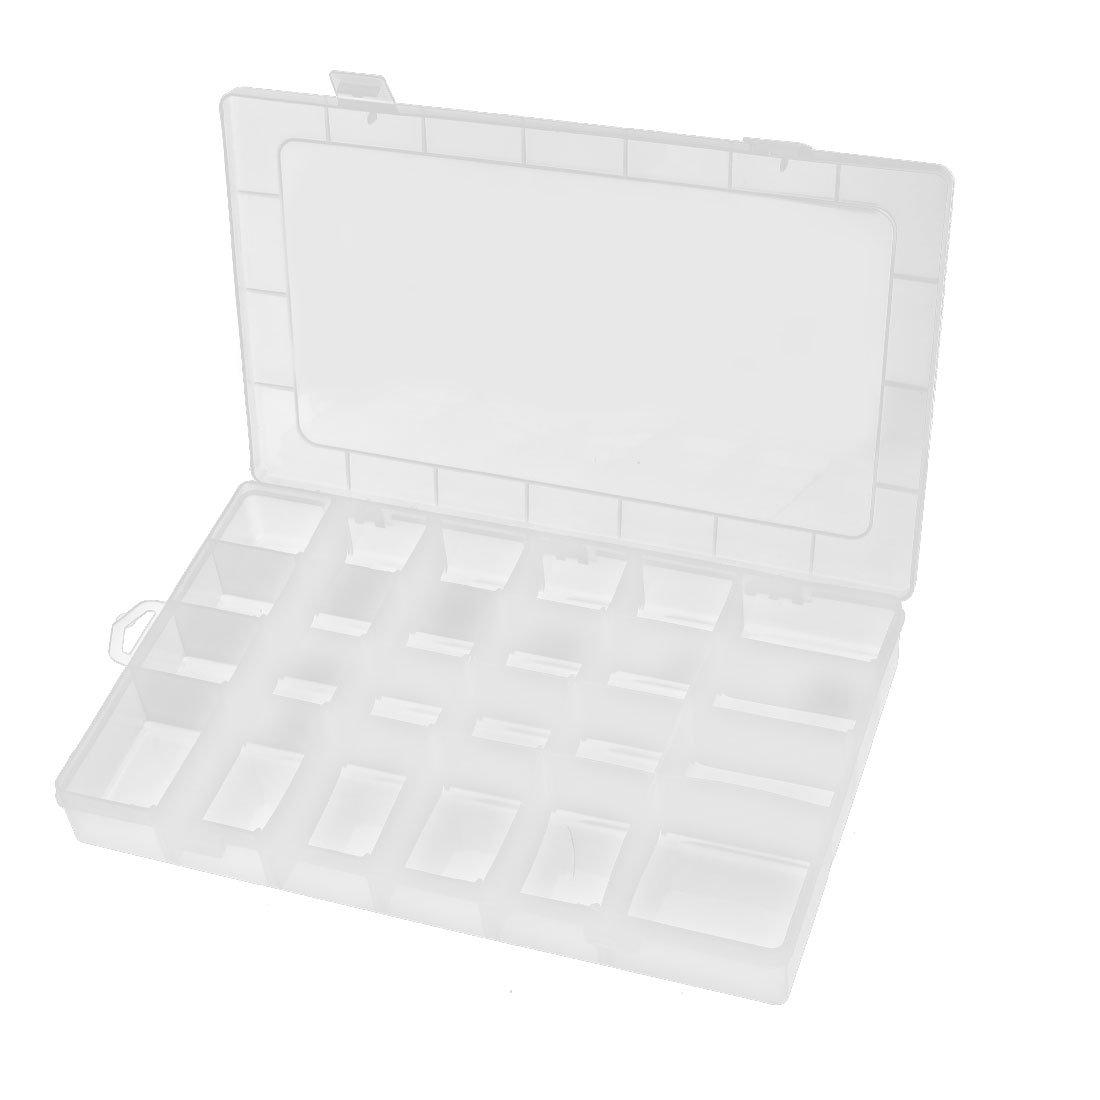 uxcell 345mmx215mmx45mm 24 Slots Component Storage Organizer Case Clear DIY Tool